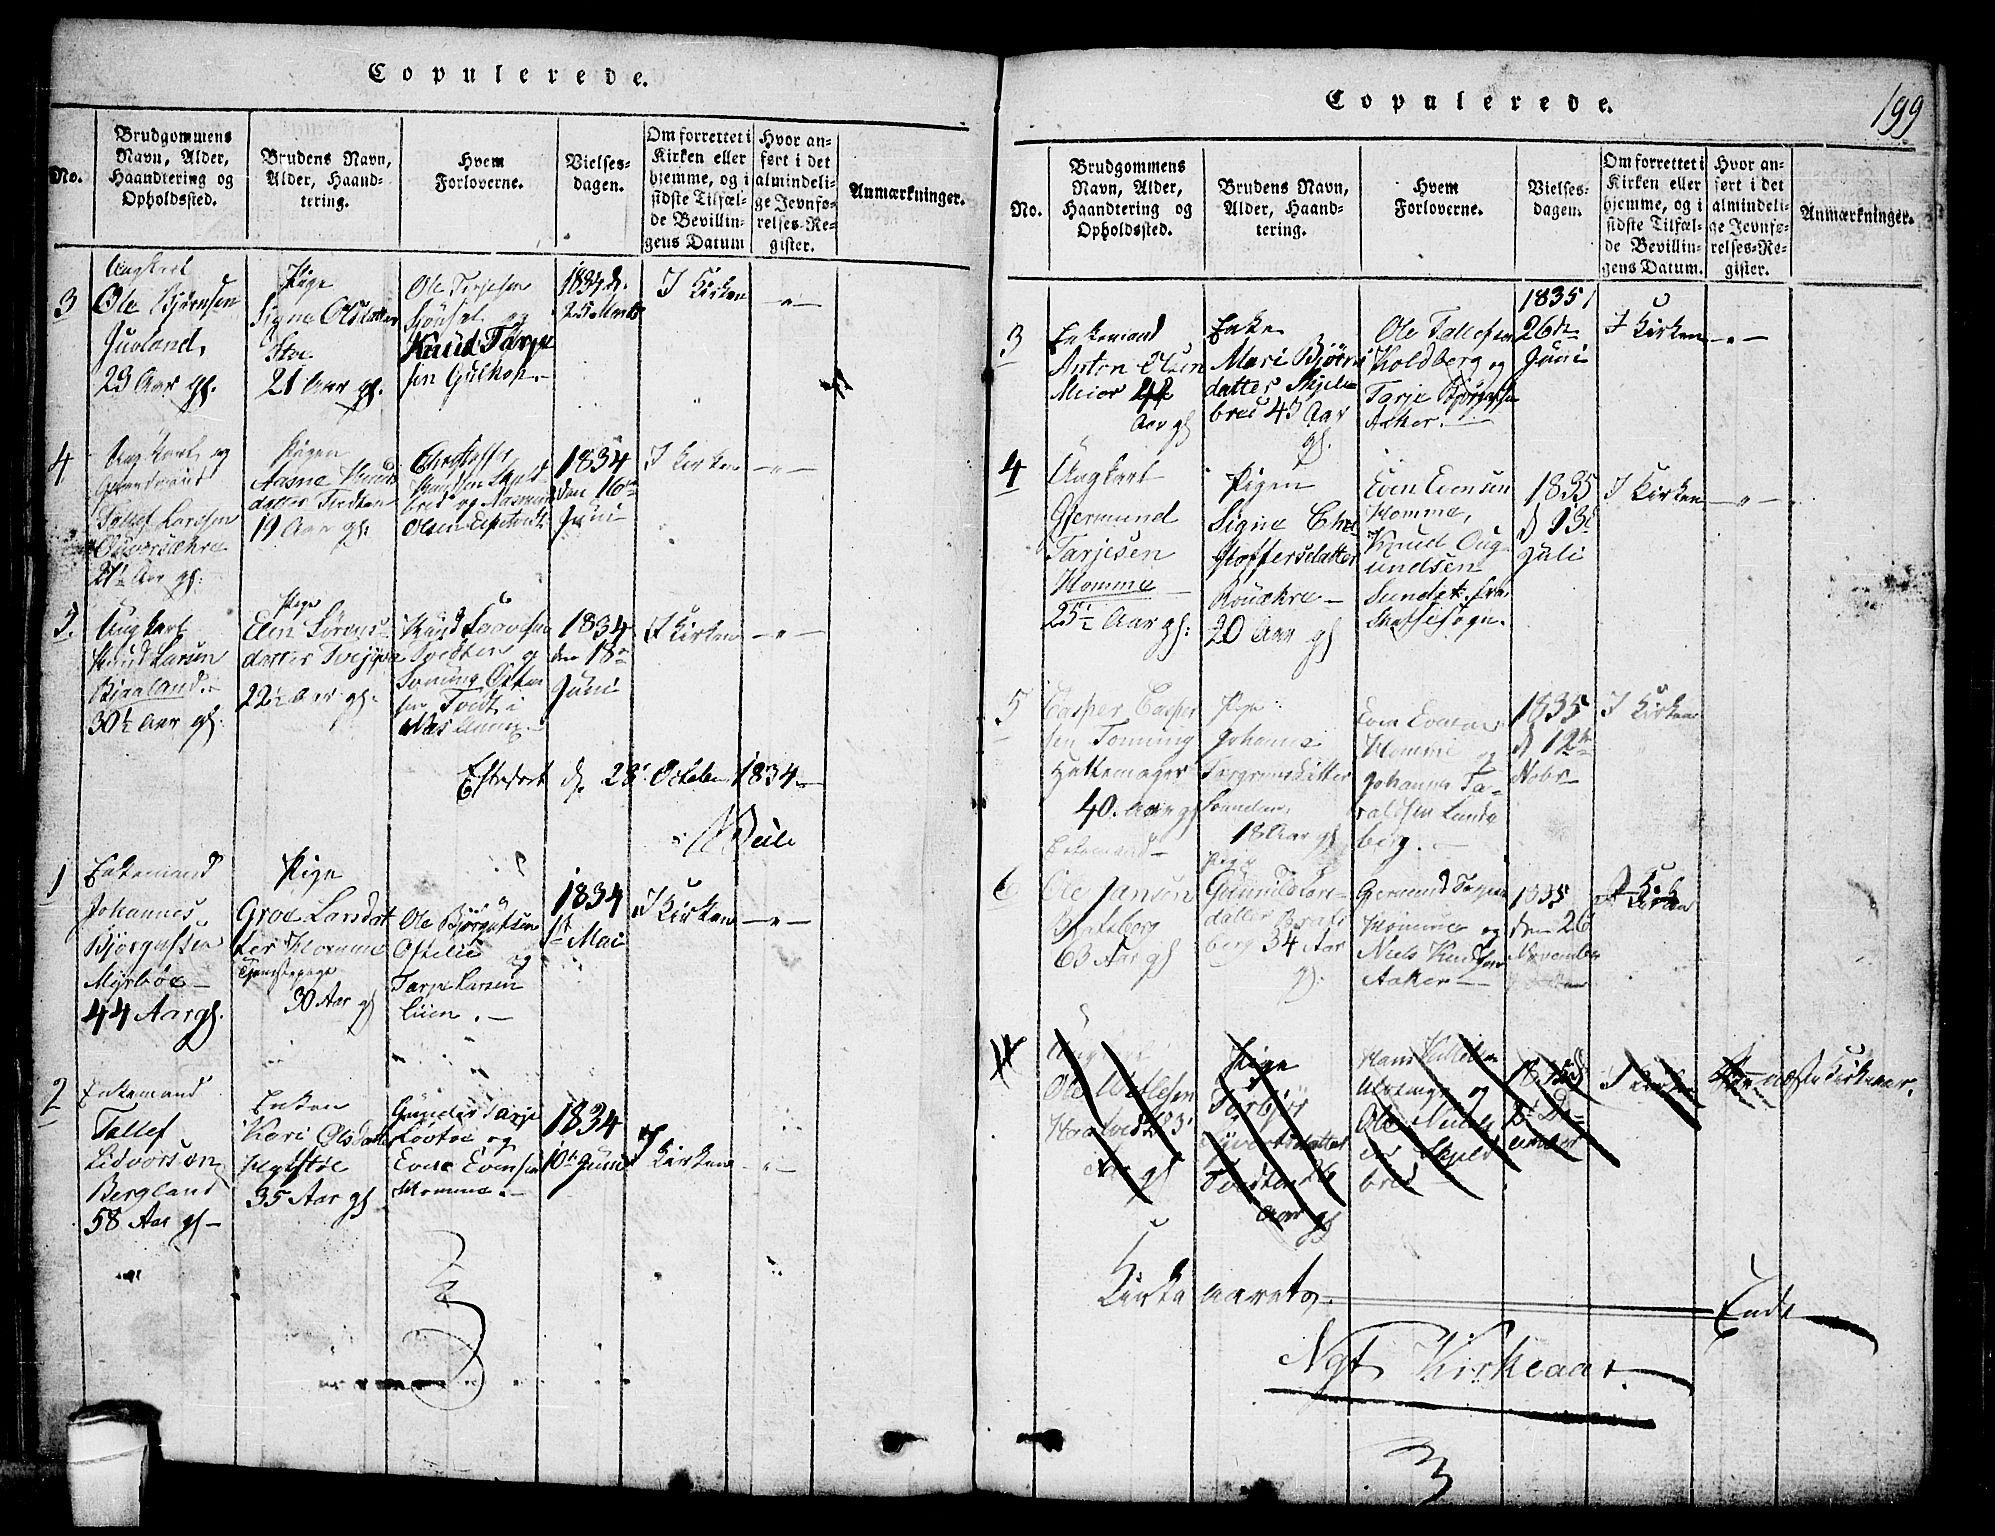 SAKO, Lårdal kirkebøker, G/Ga/L0001: Klokkerbok nr. I 1, 1815-1861, s. 199